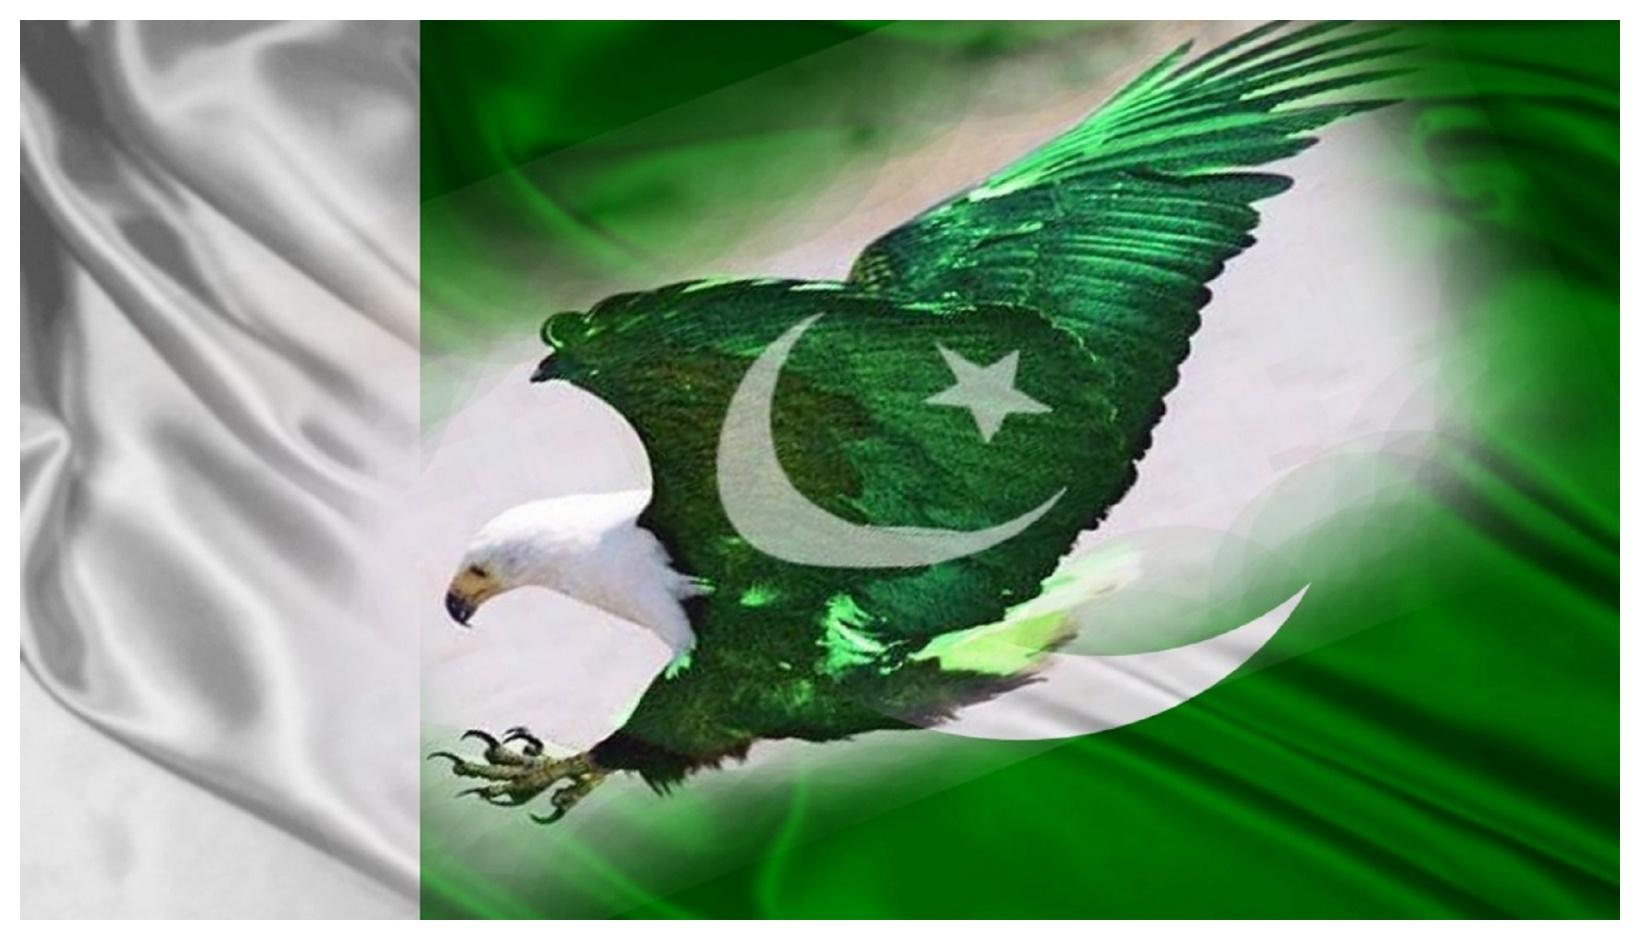 Pakistan National Flag HD